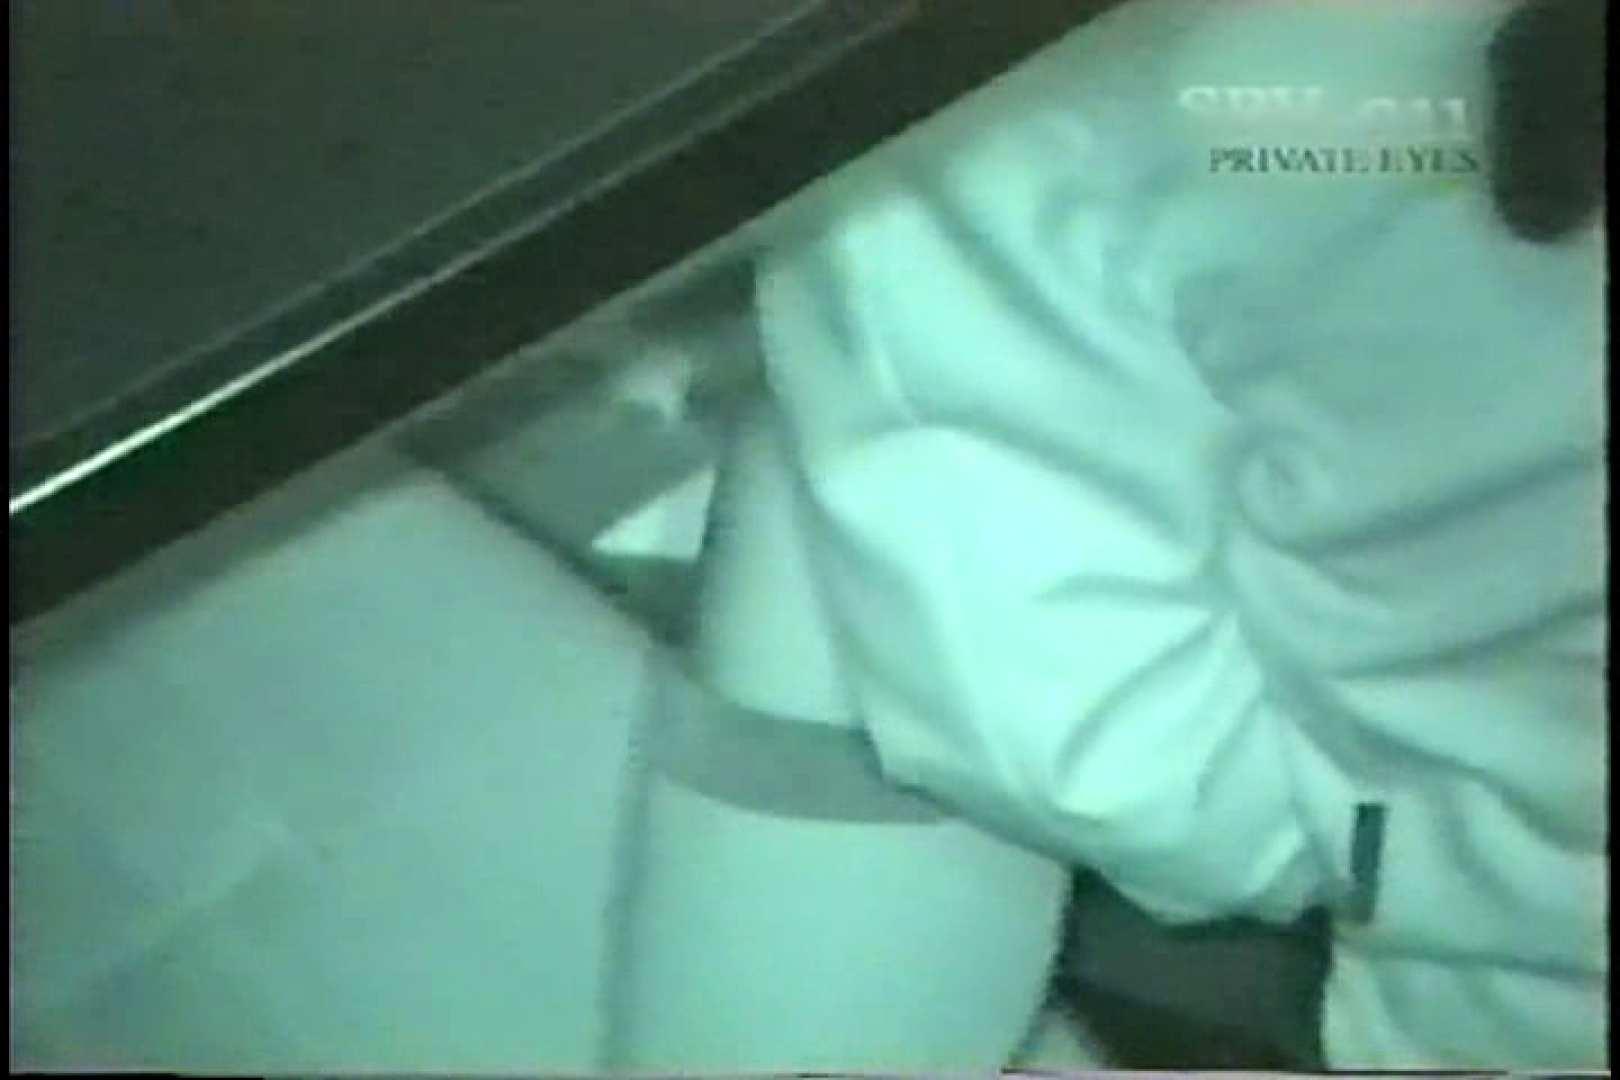 高画質版!SPD-011 盗撮 カーセックス黙示録 (VHS) セックス | カーセックス  94連発 85